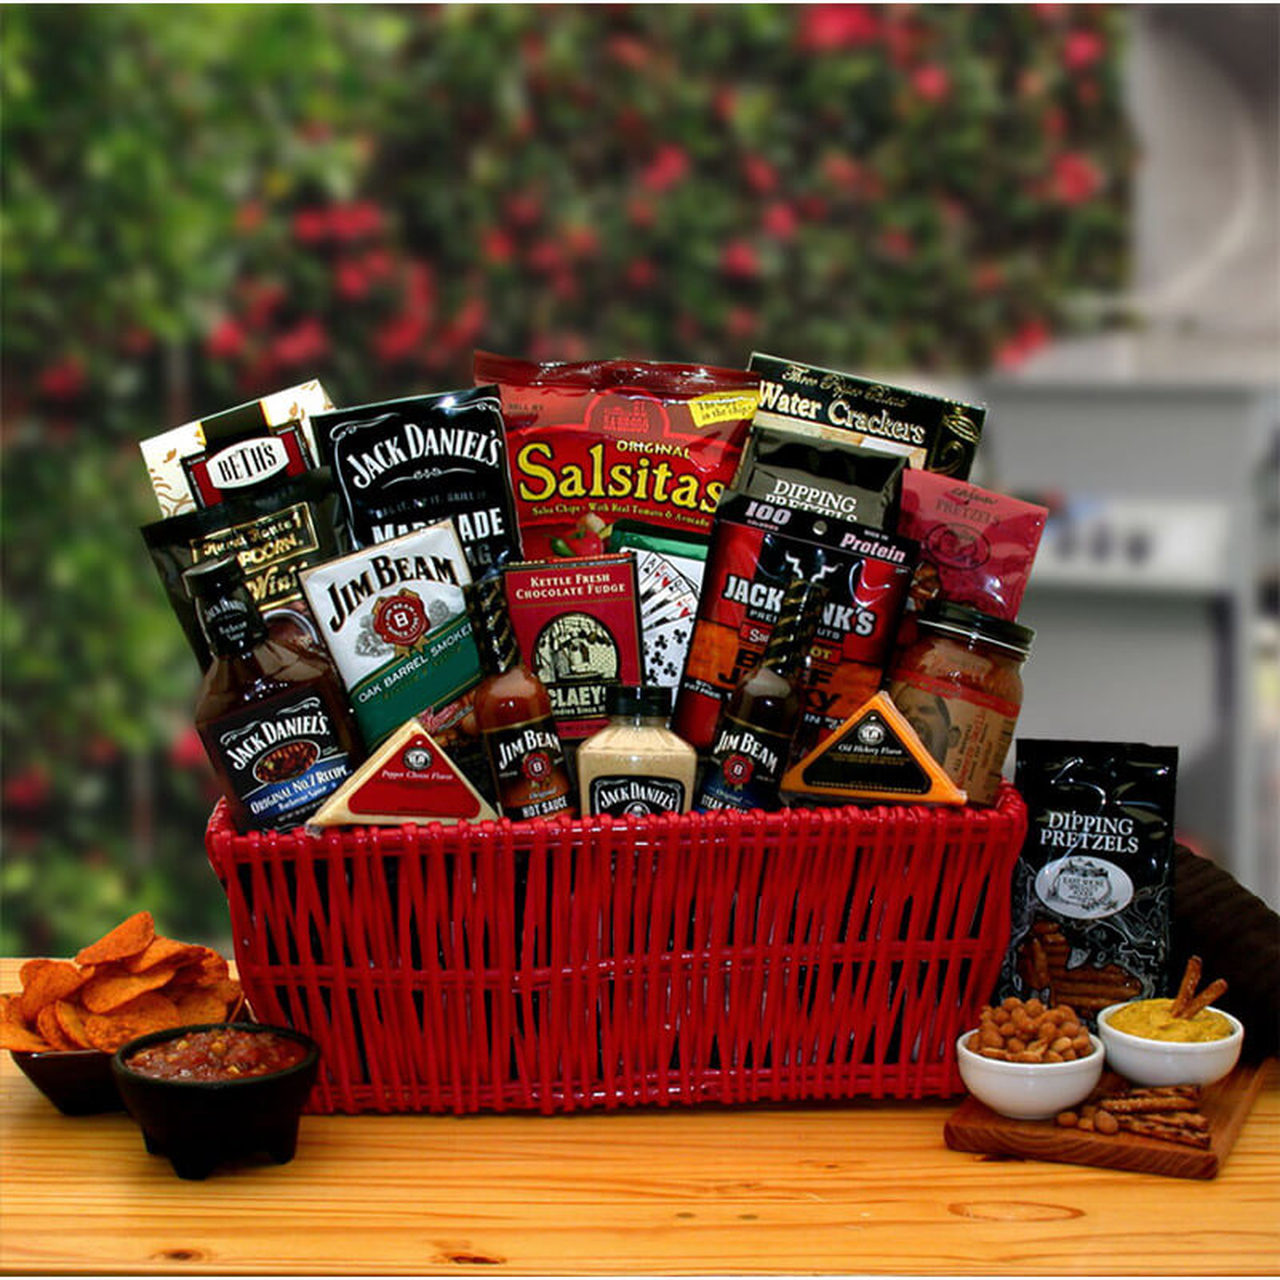 Jack Daniels Grilling Gift Basket for Barbecuing Gifter World